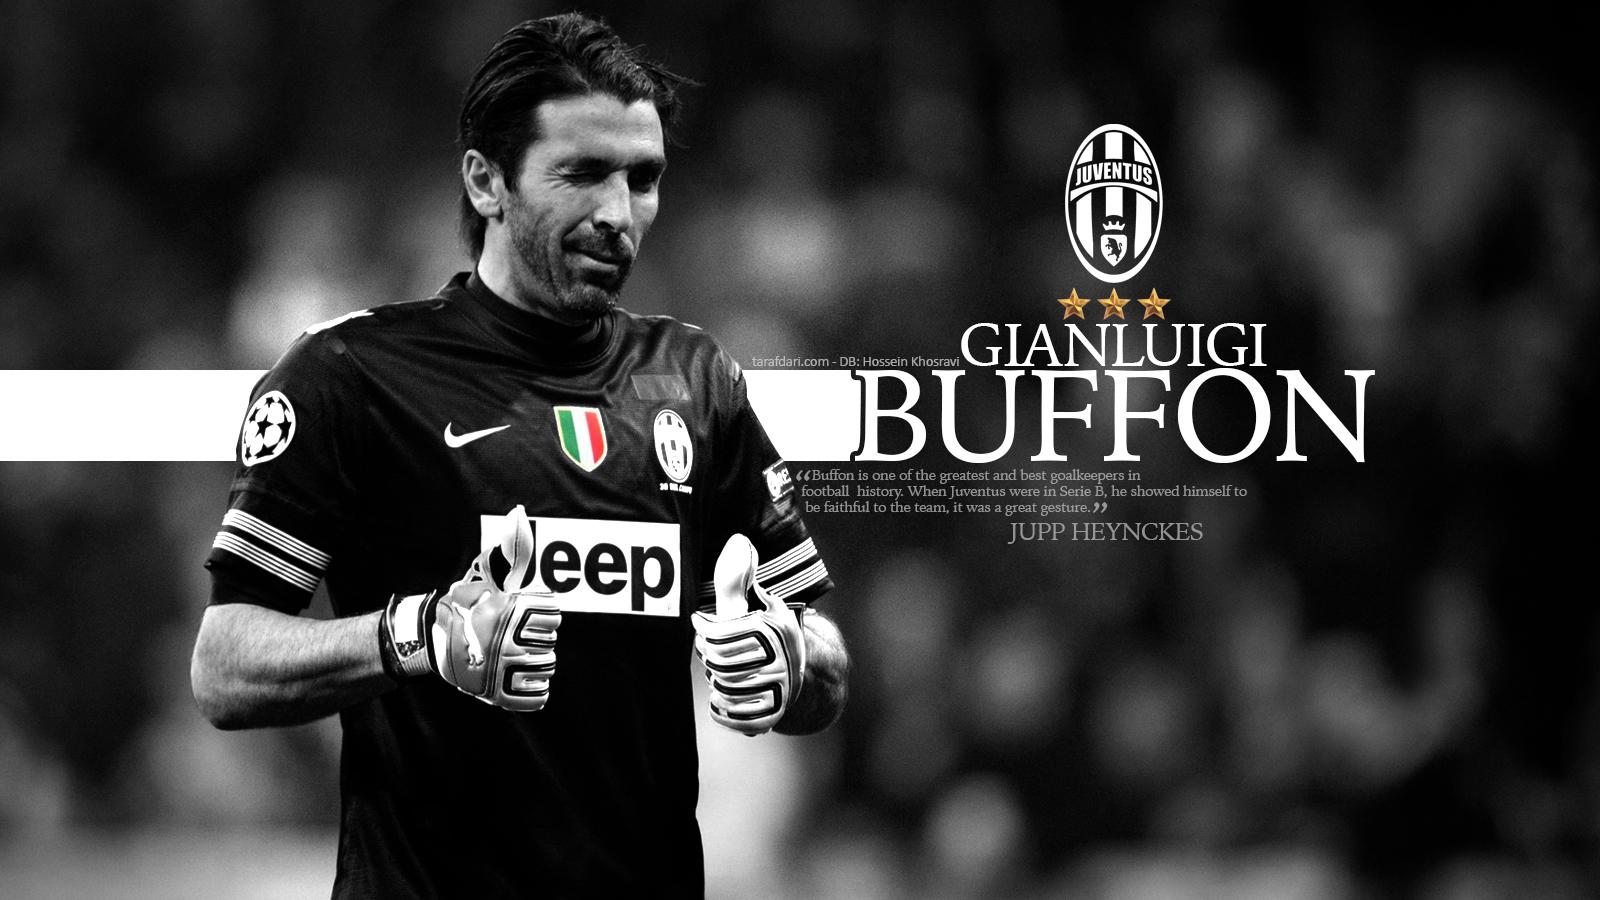 جانلوییجی بوفون-Gianluigi Buffon